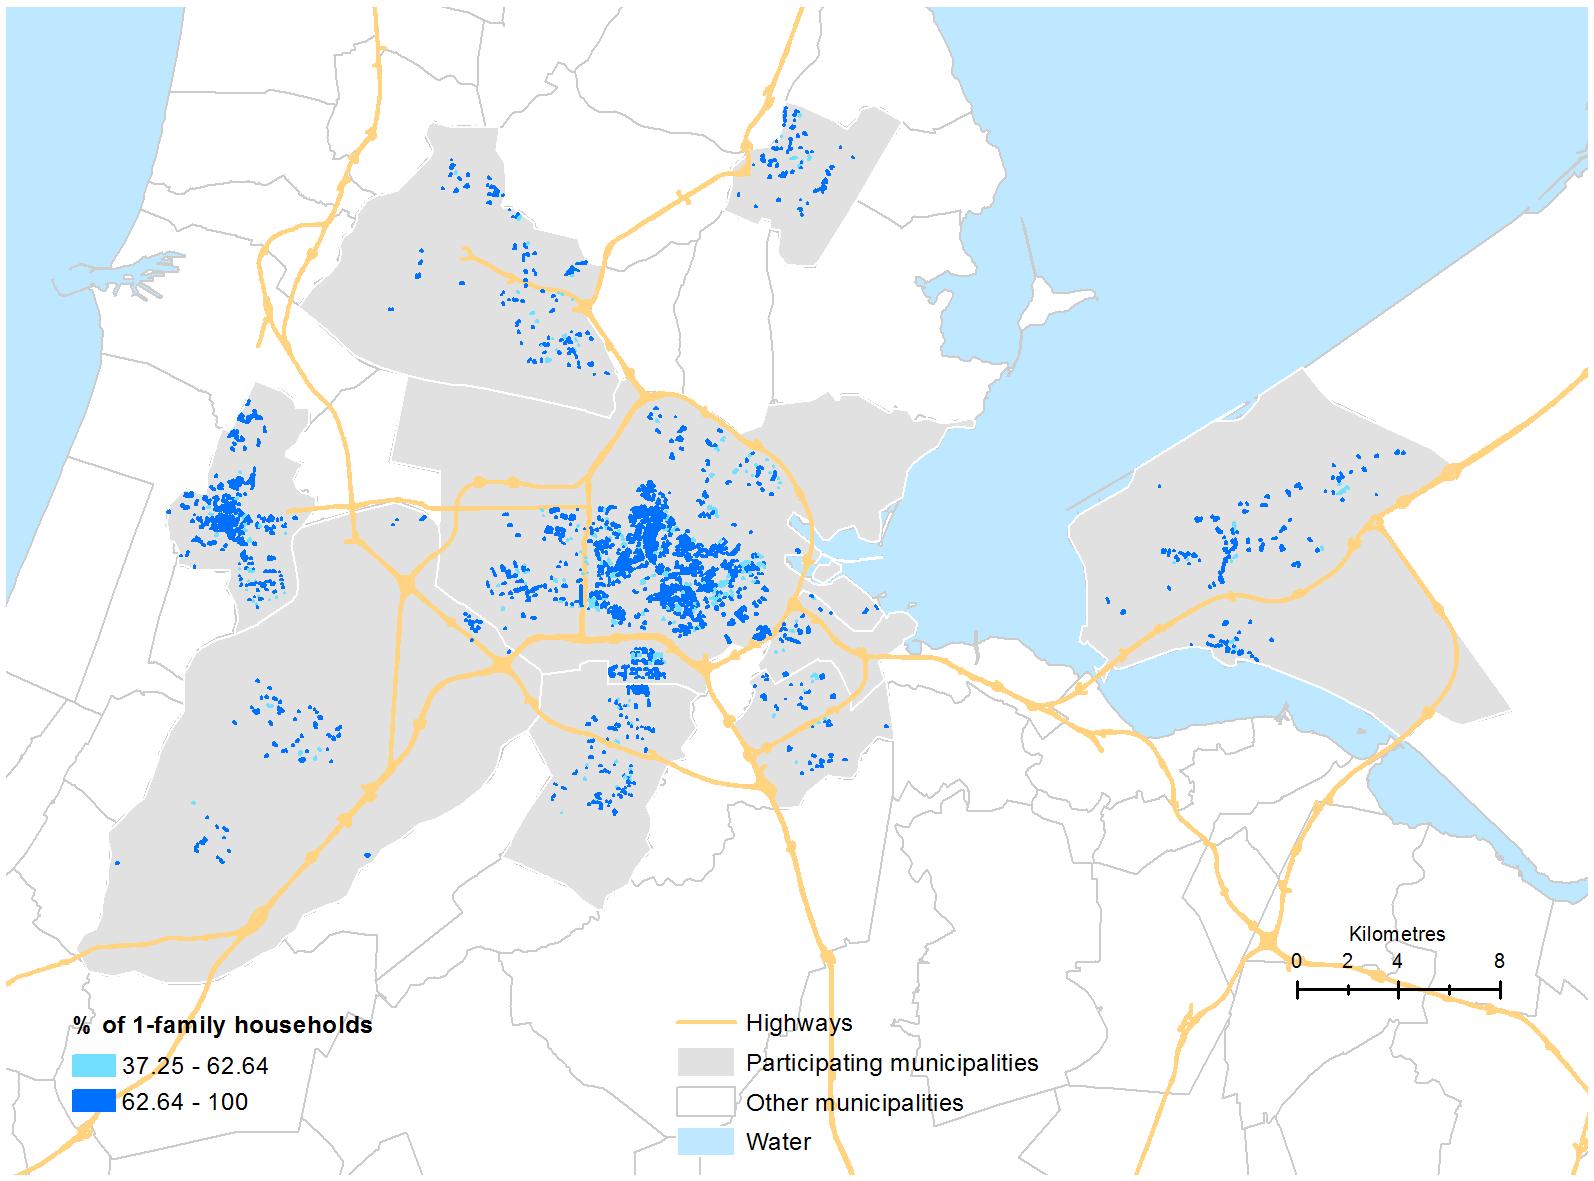 Crossing boundaries mapping spatial dynamics of urban phenomena at url httpjournalsopeneditionbelgeodocannexeimage17740img 4g fandeluxe Choice Image